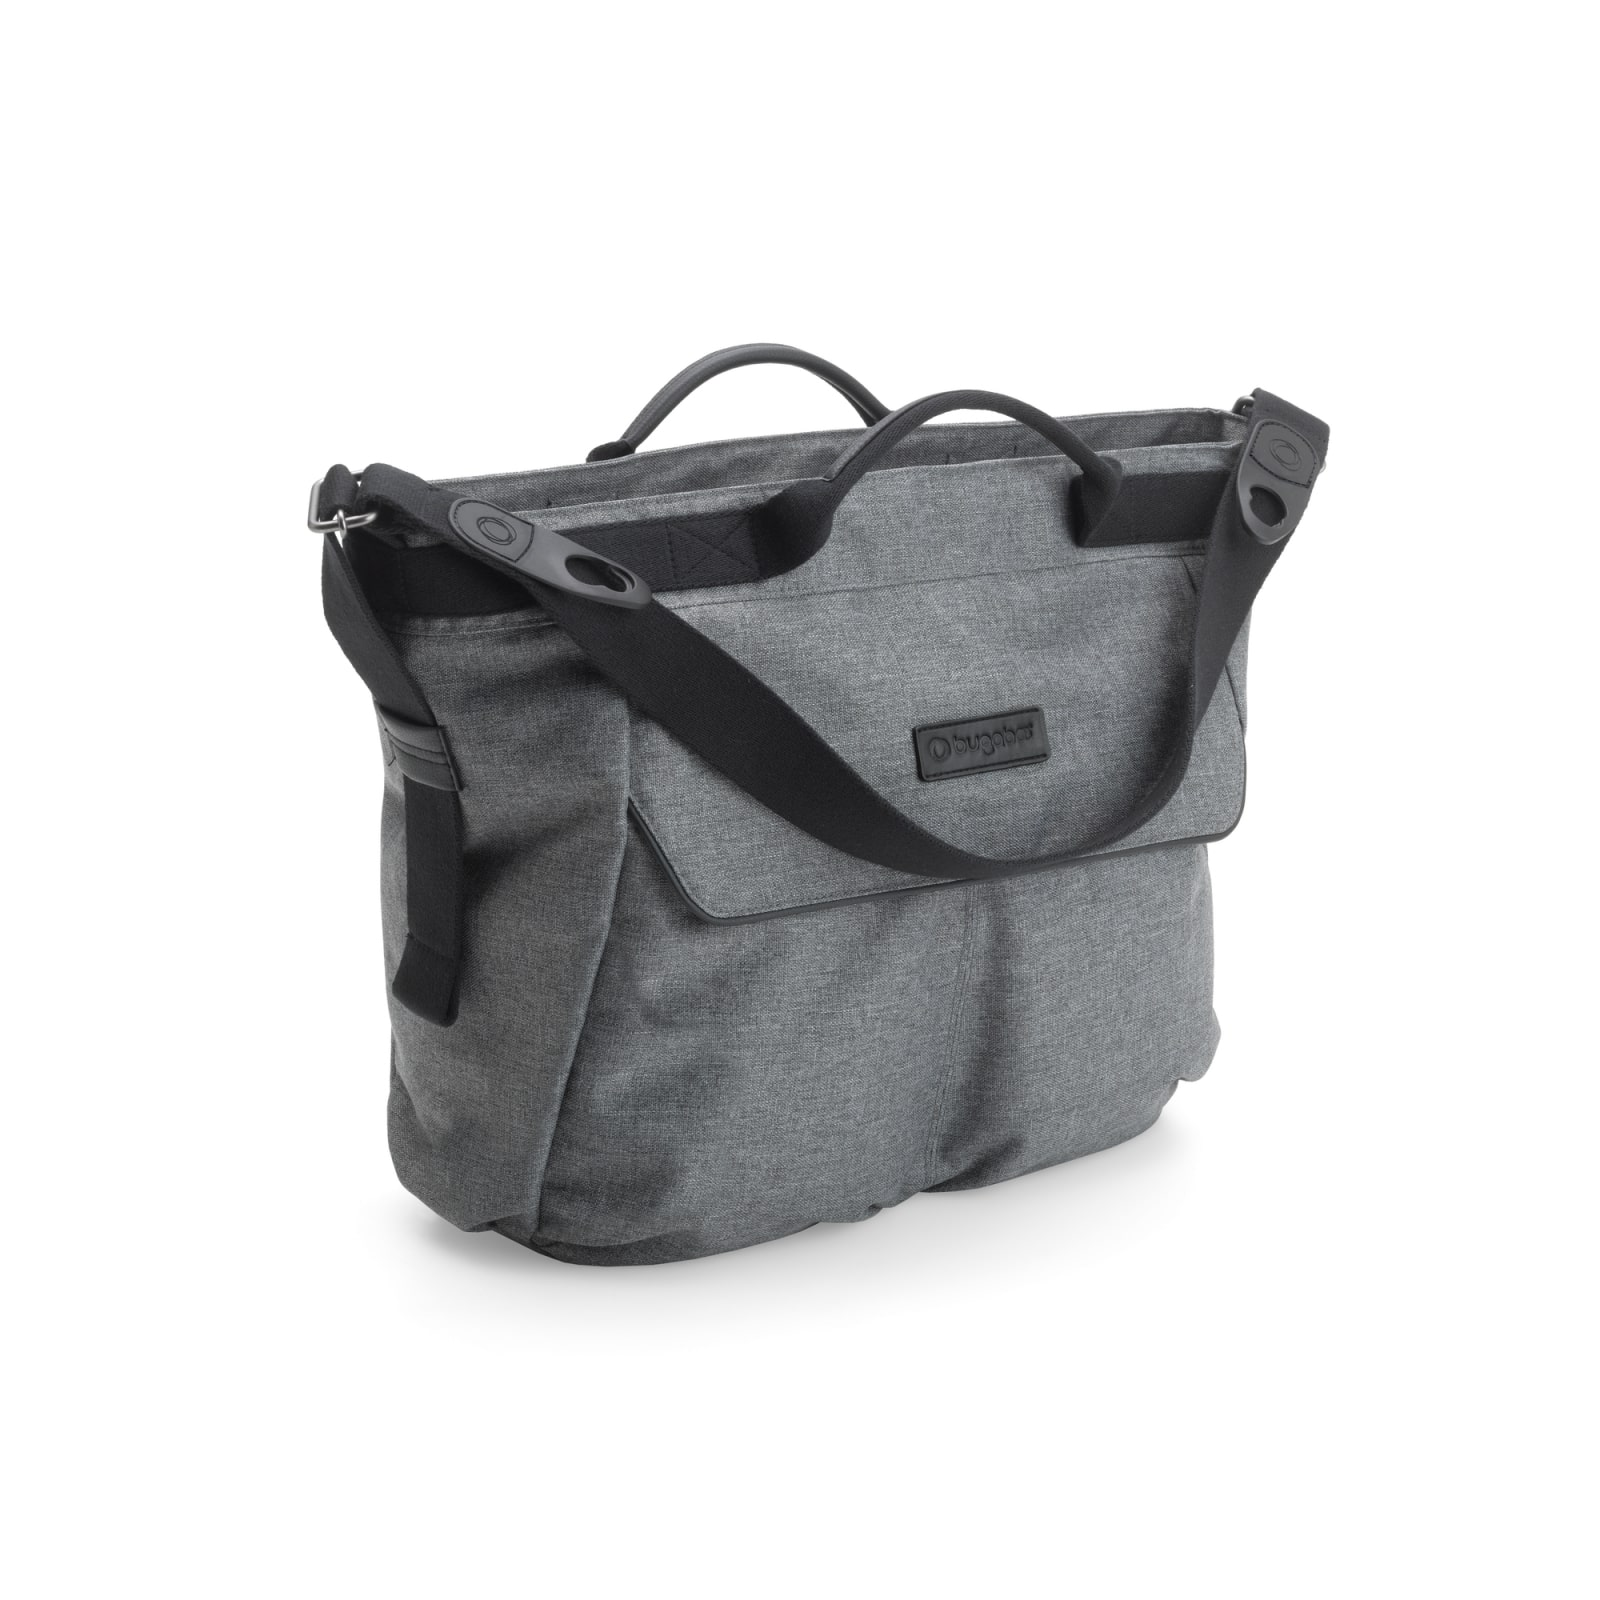 Bugaboo Τσάντα Αλλαγής Grey Melange